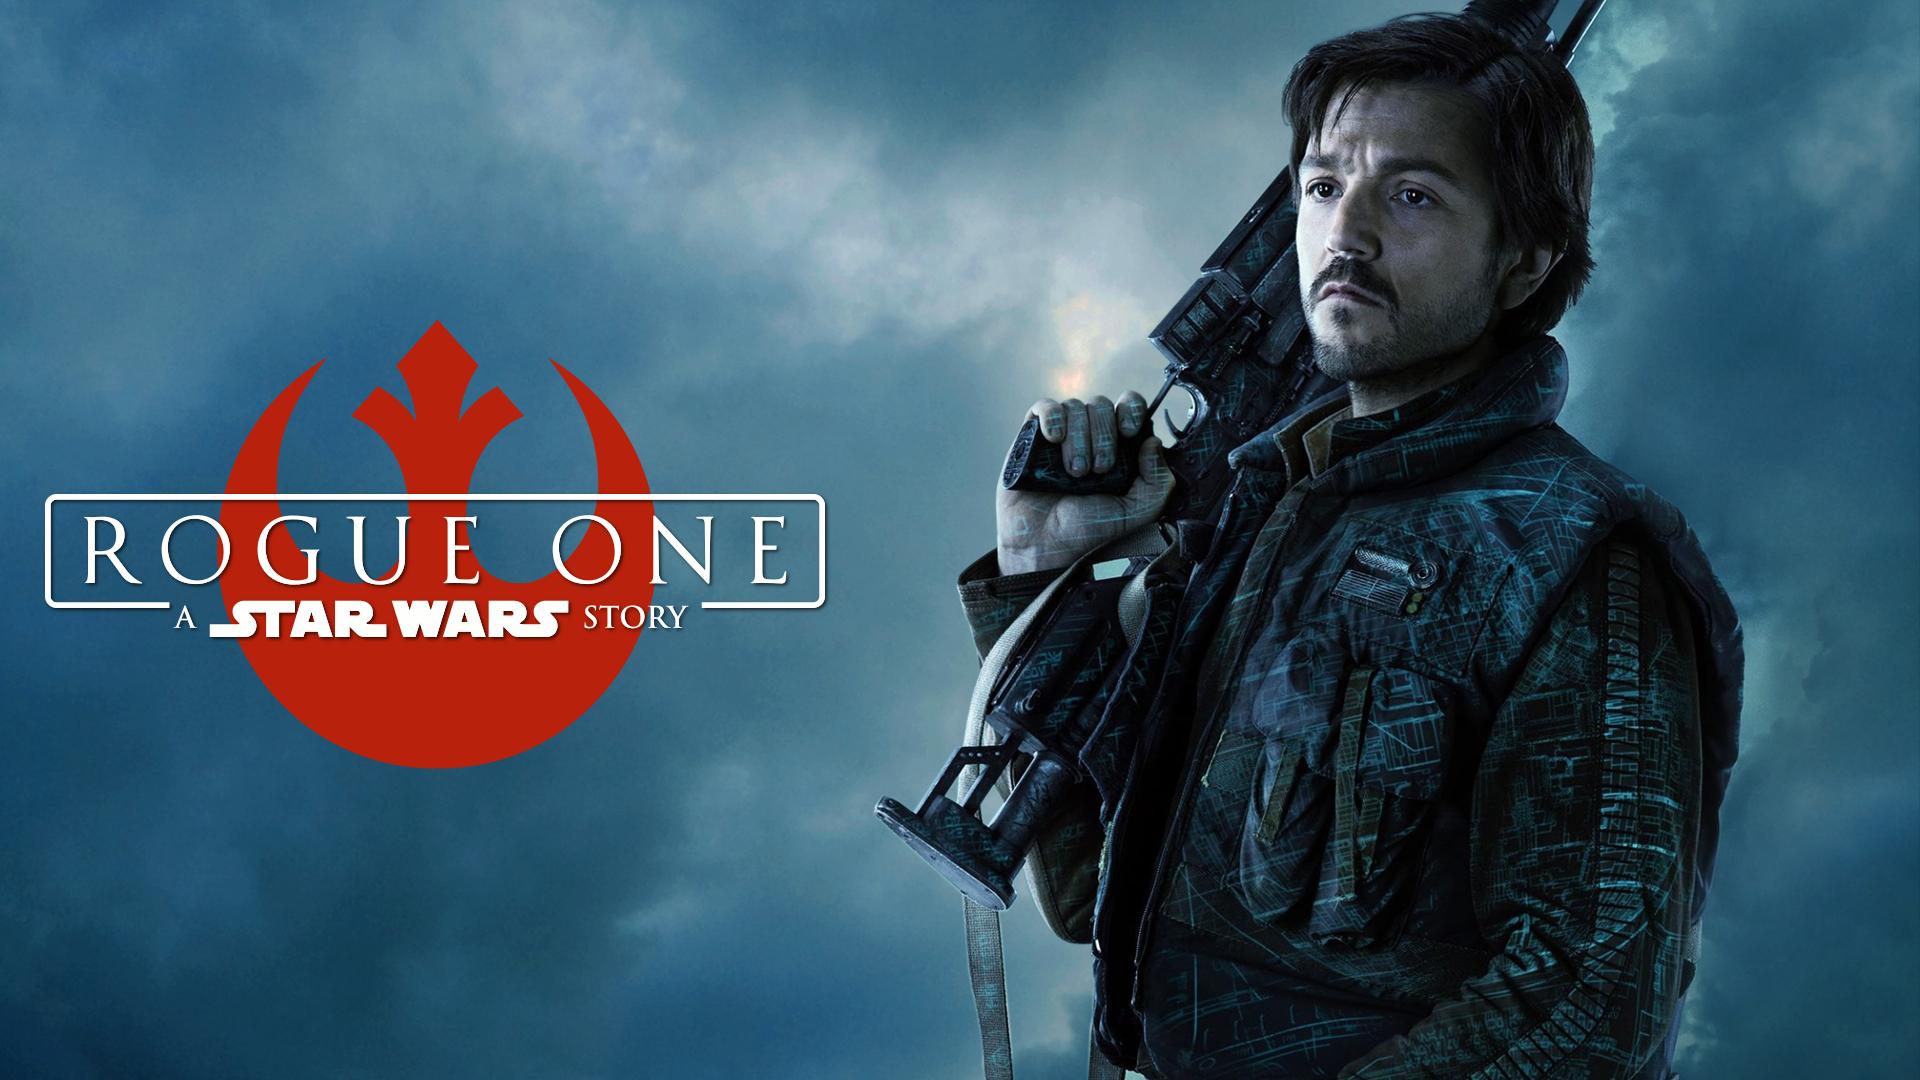 Rogue One Wallpaper Cassian Andor 2 Star Wars Film Star Wars Fan Art Rogues